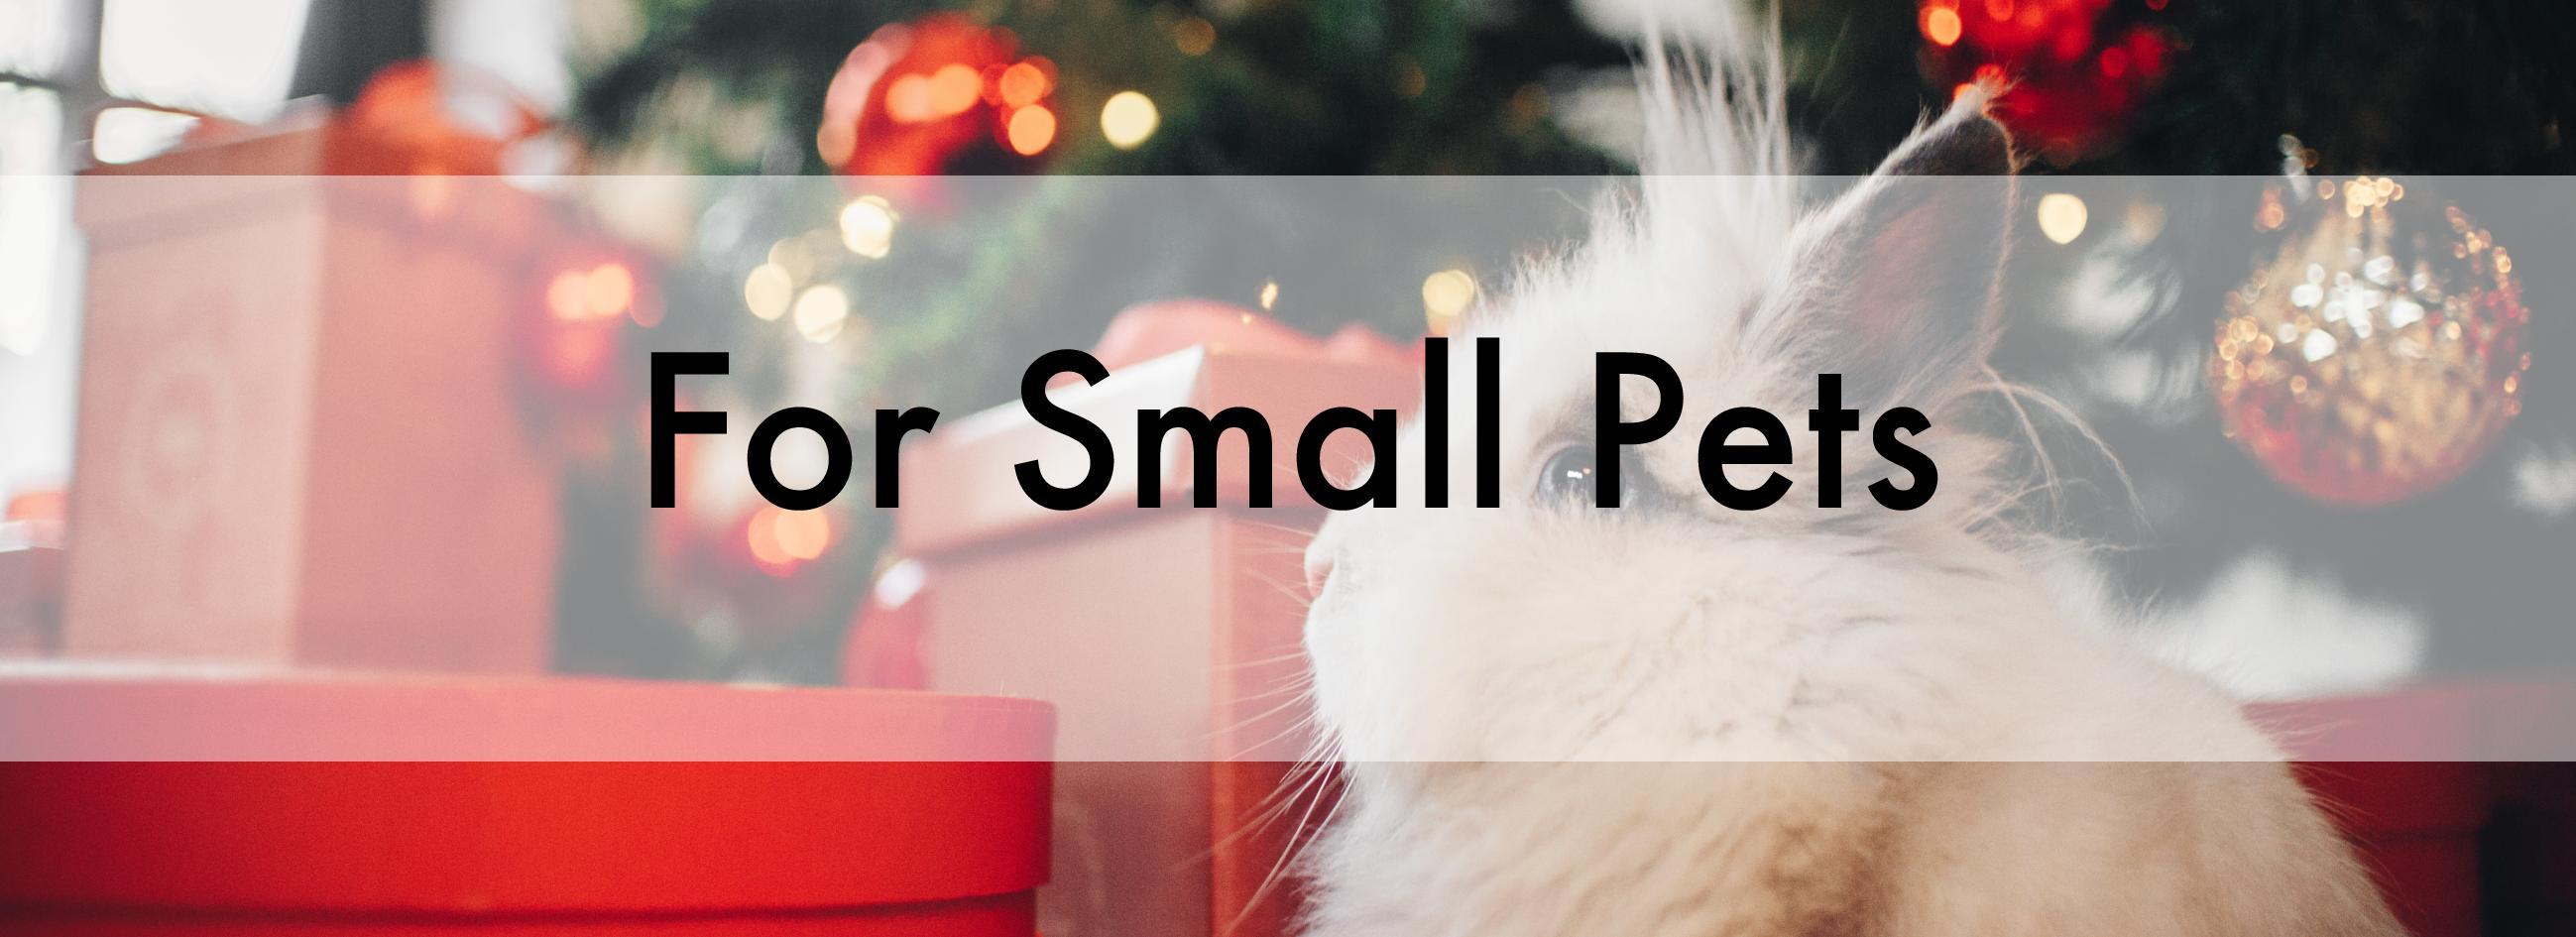 Christmas Banner for Small Pets